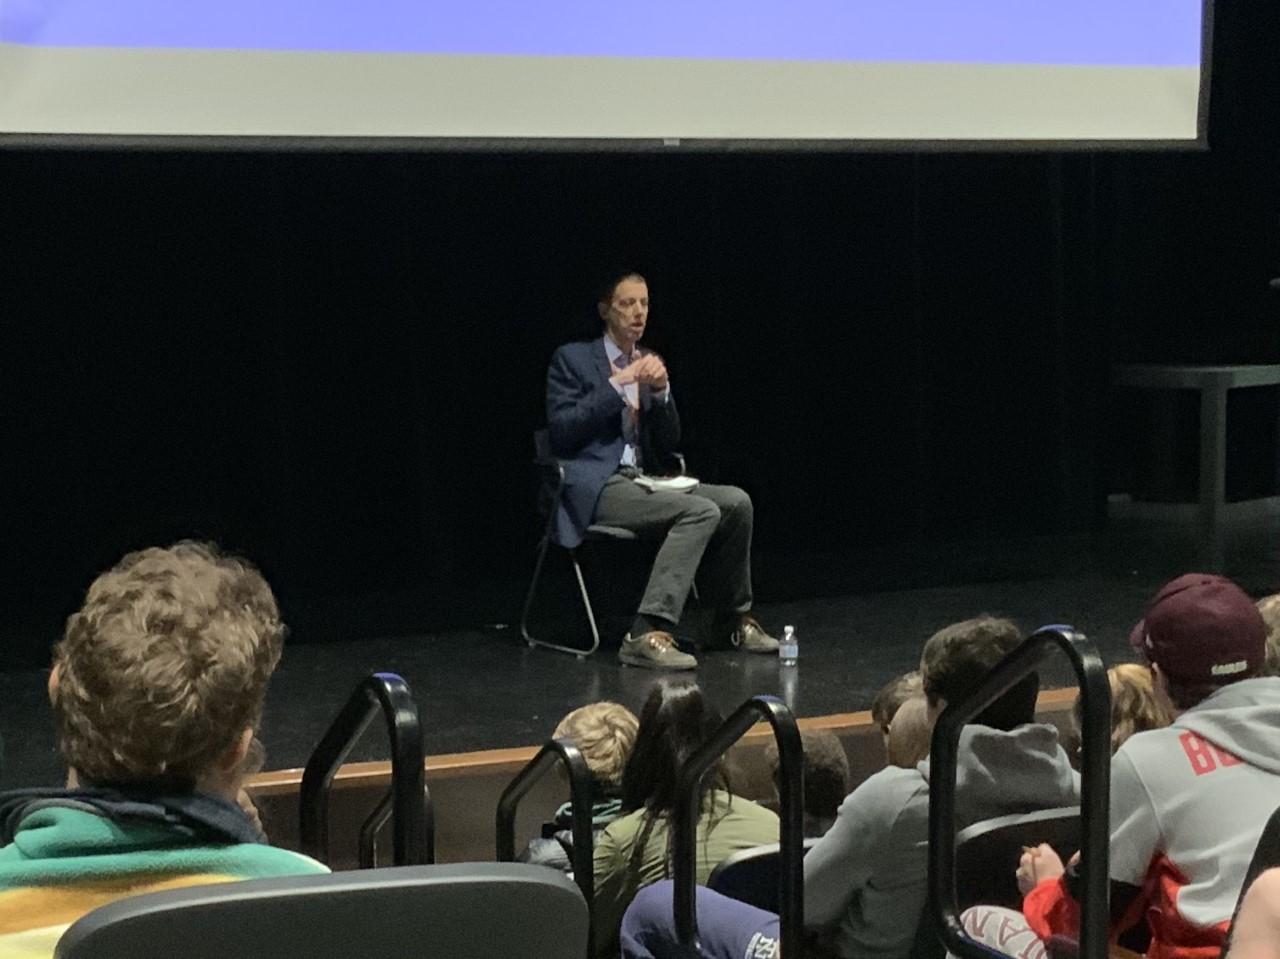 K.C. Johnson speaking to NT students